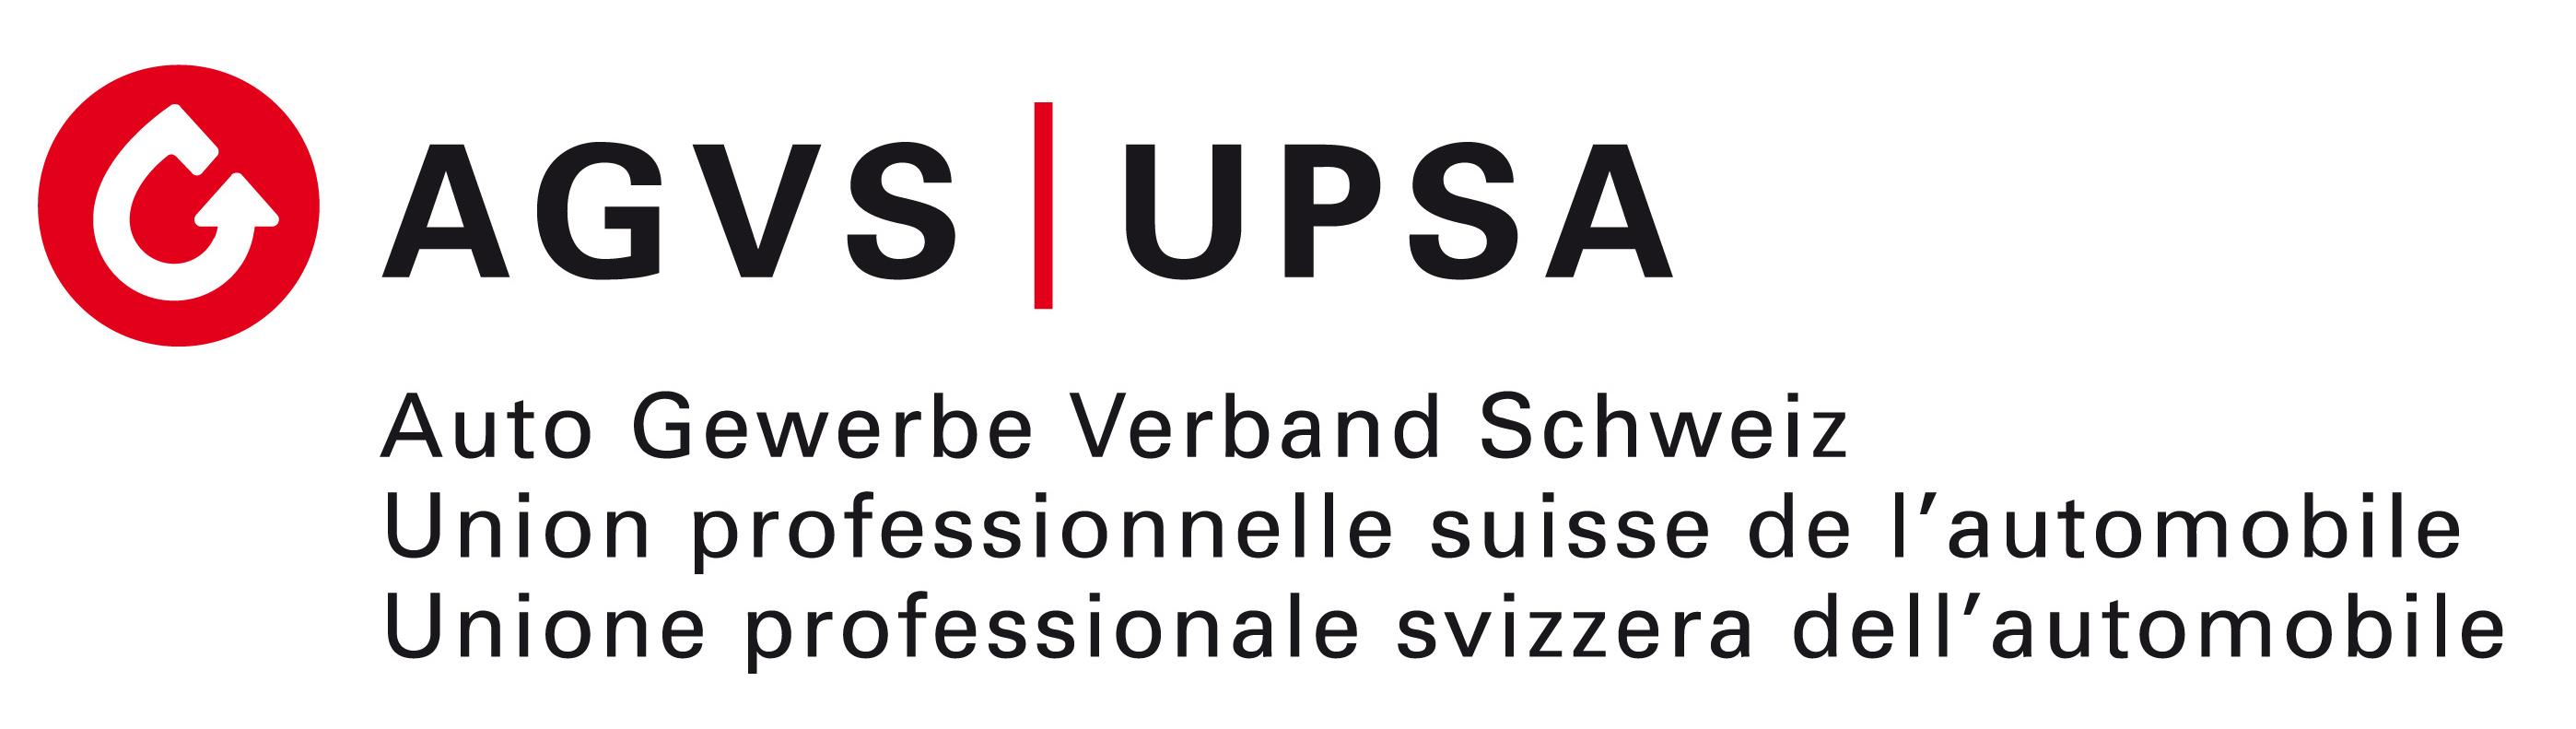 logo AGVS / UPSA